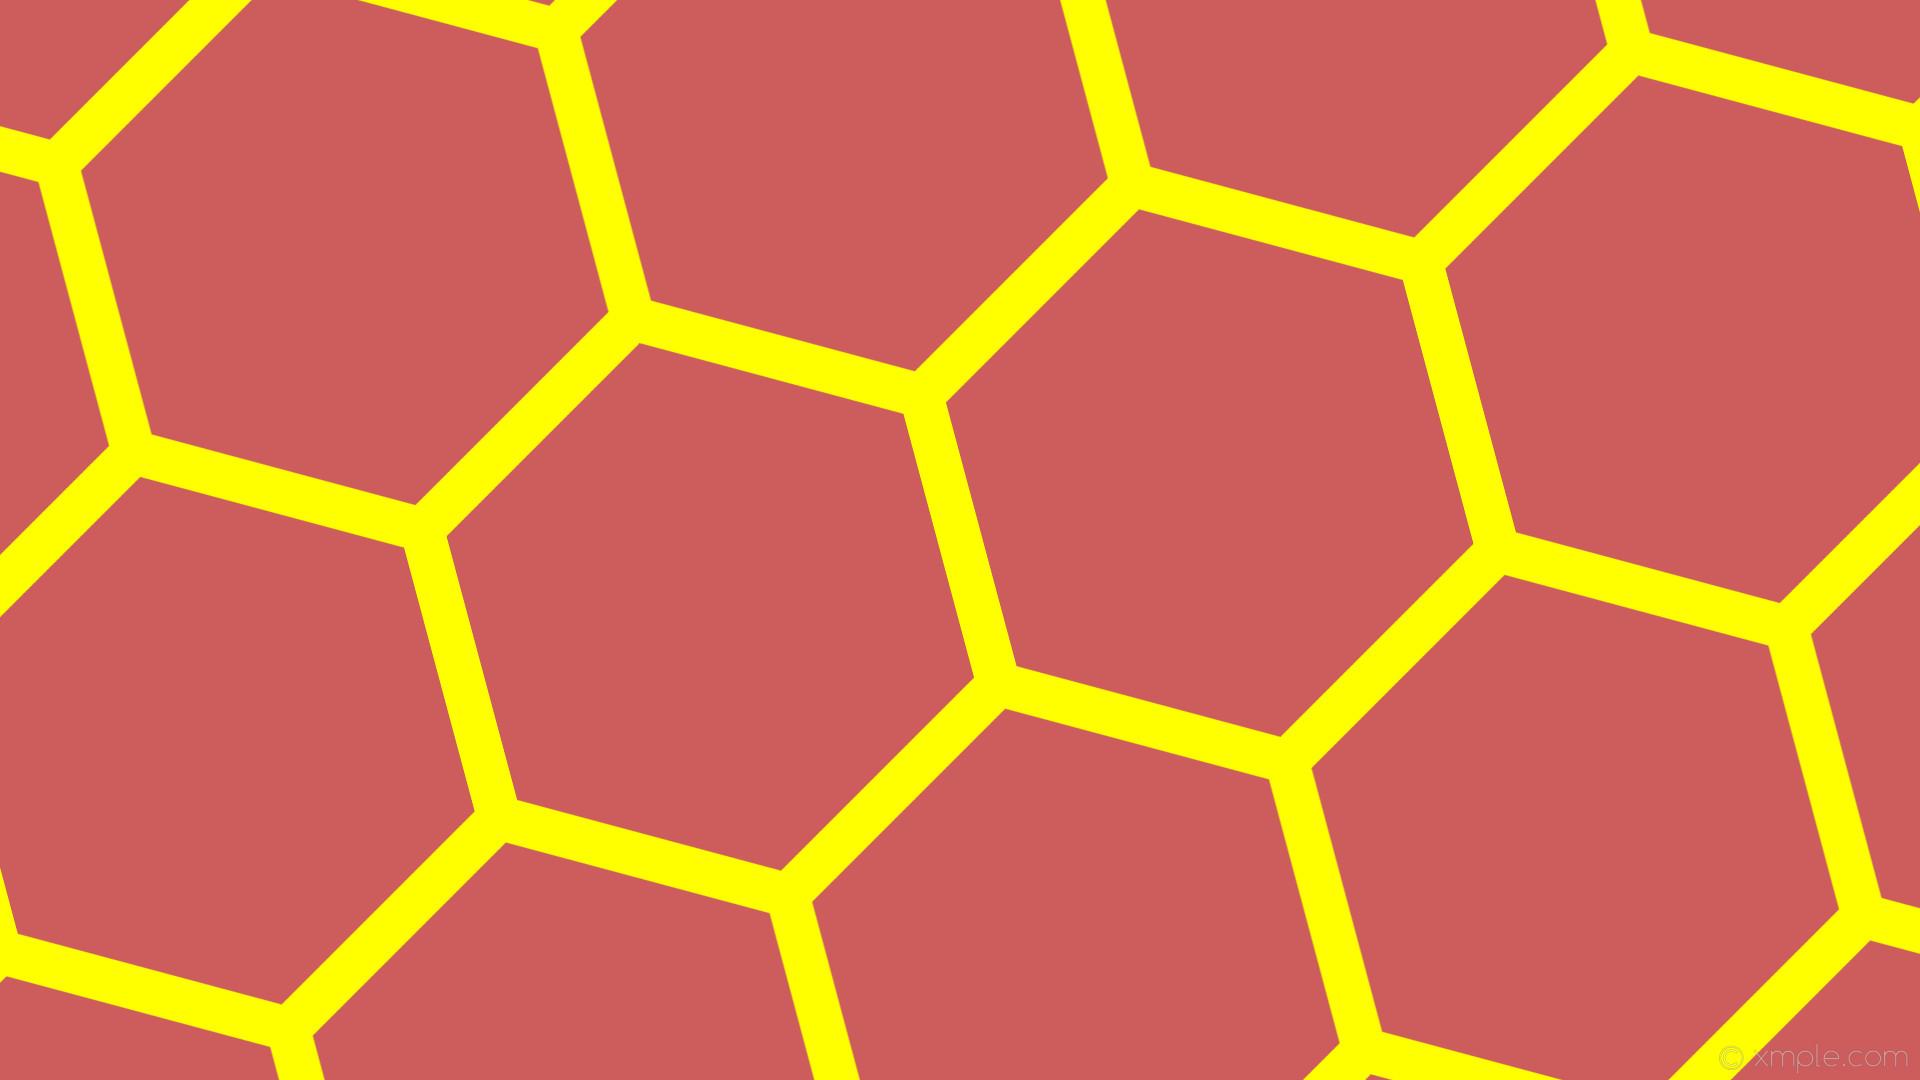 wallpaper hexagon red beehive yellow honeycomb indian red #cd5c5c #ffff00  diagonal 15° 44px